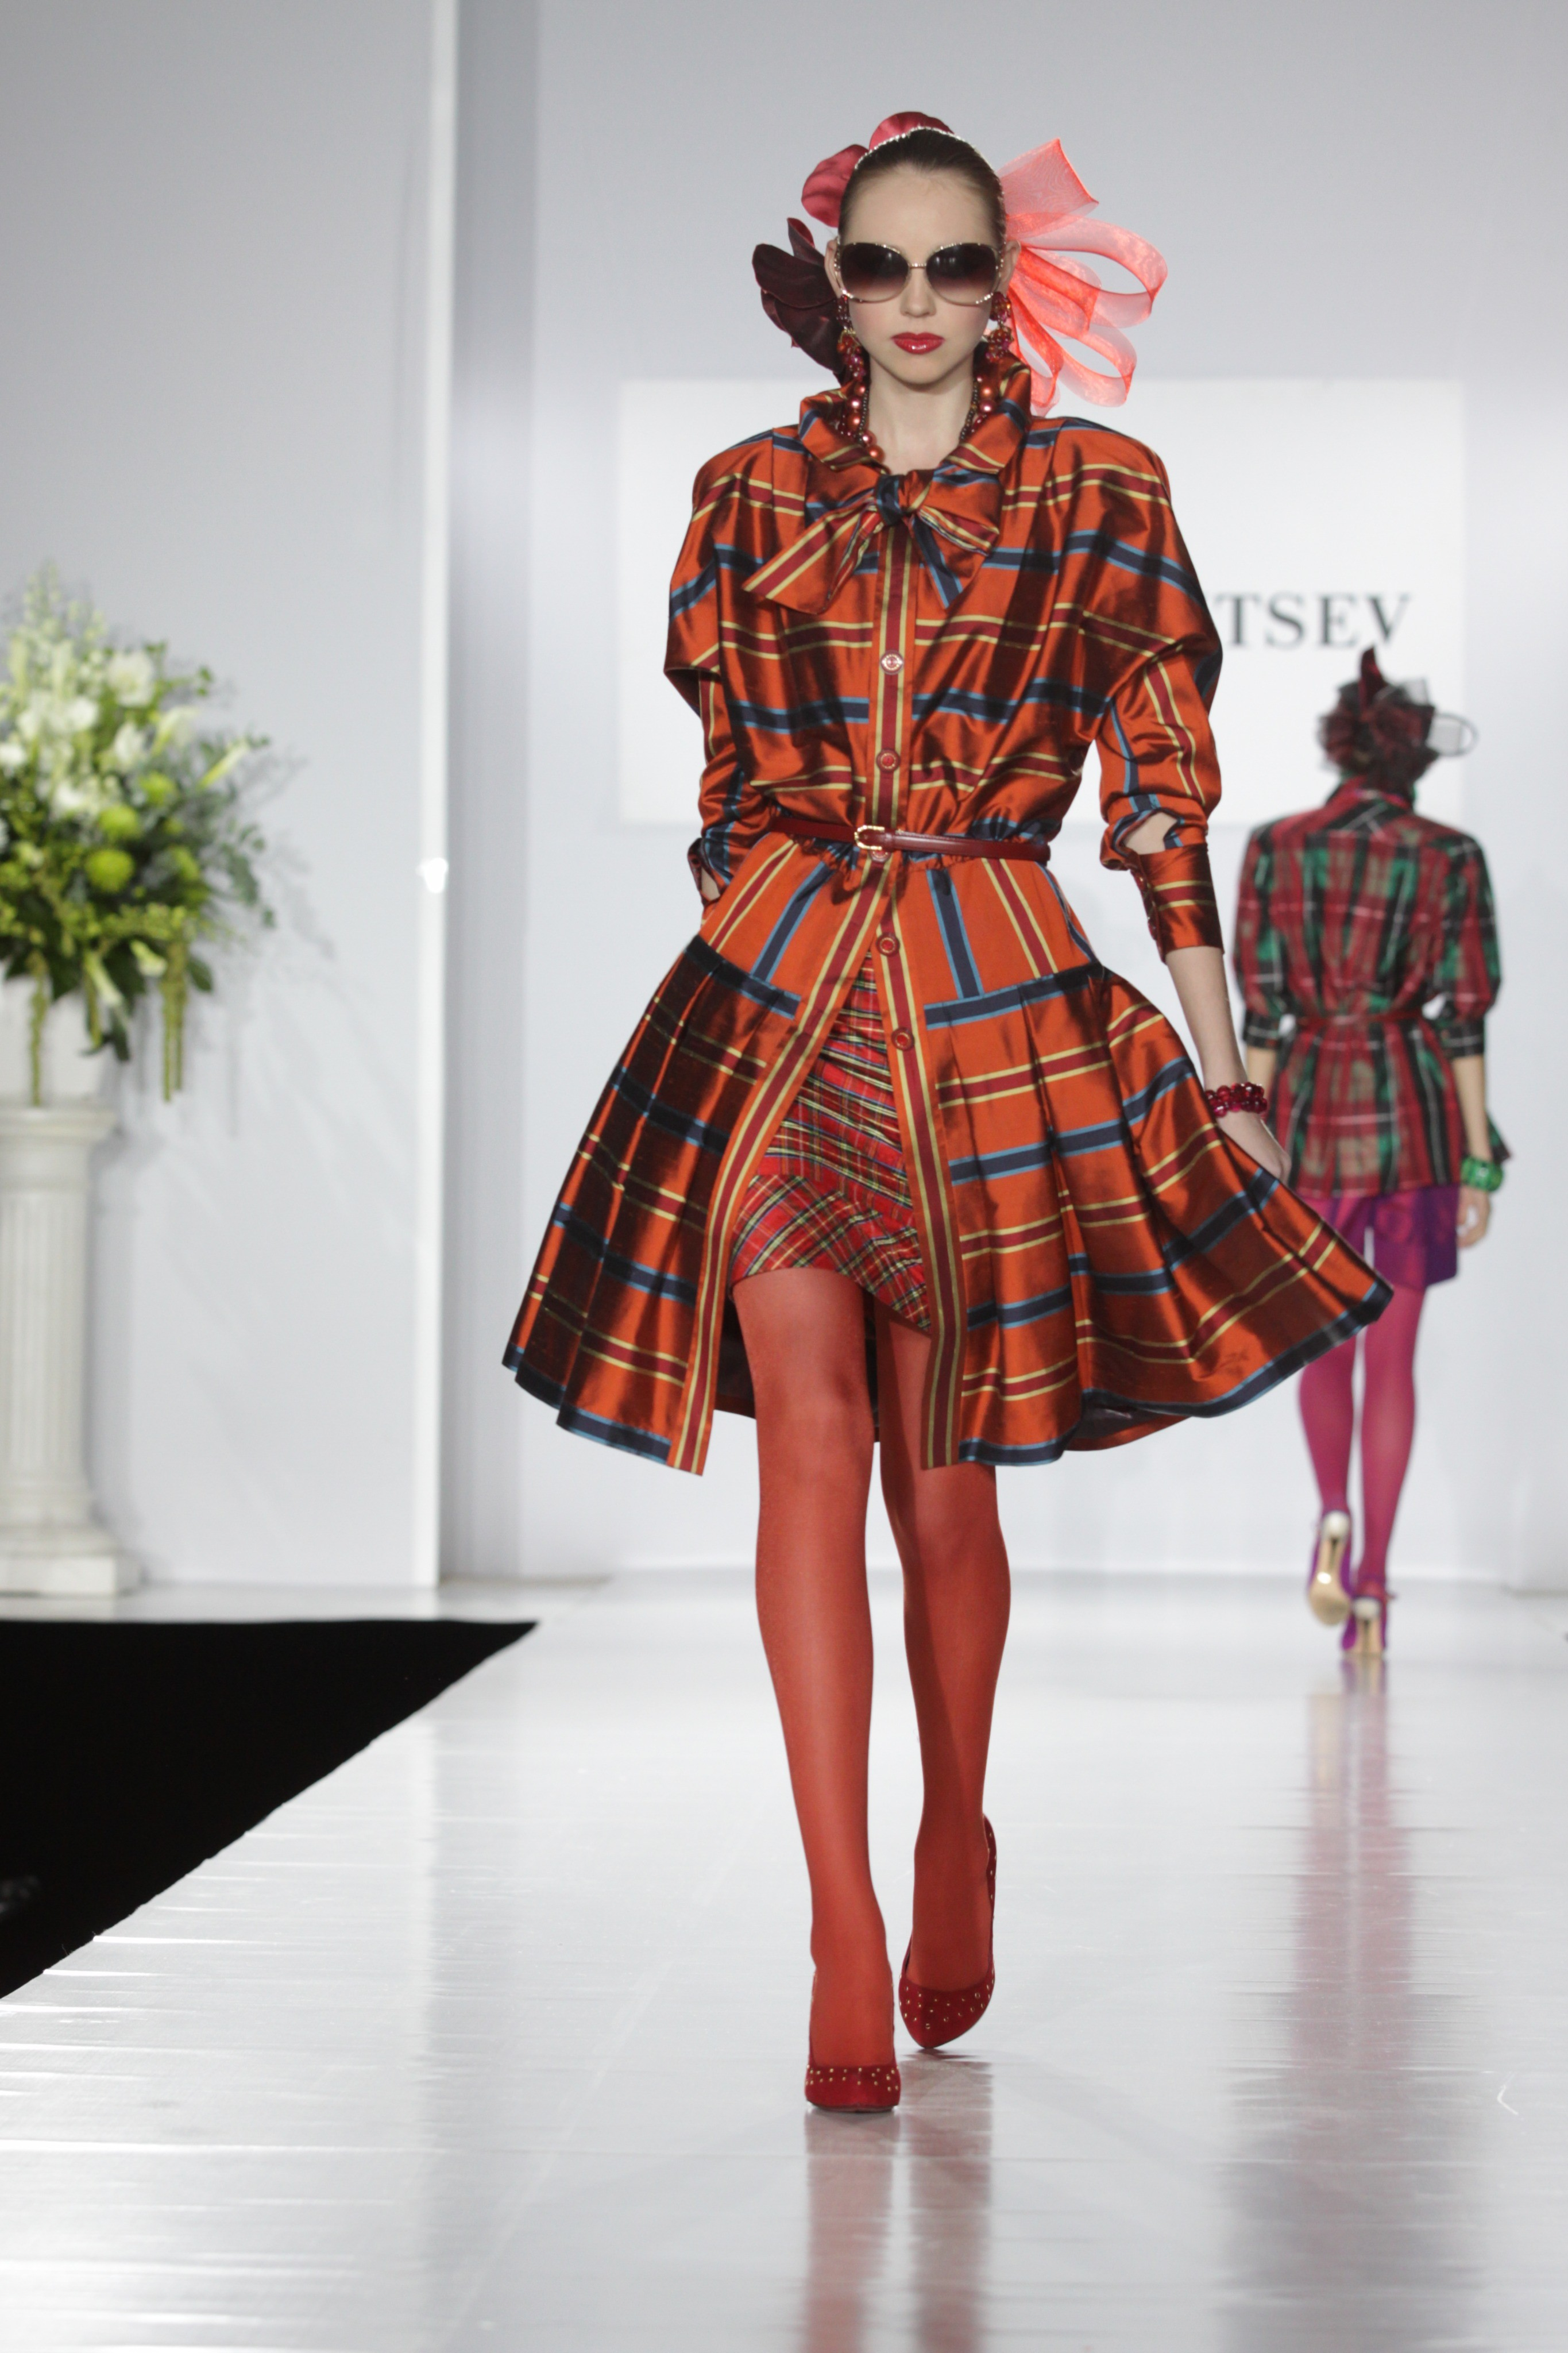 Какие модные тренды захватят нас в 2019 году? 7 тенденций от Вячеслава Зайцева